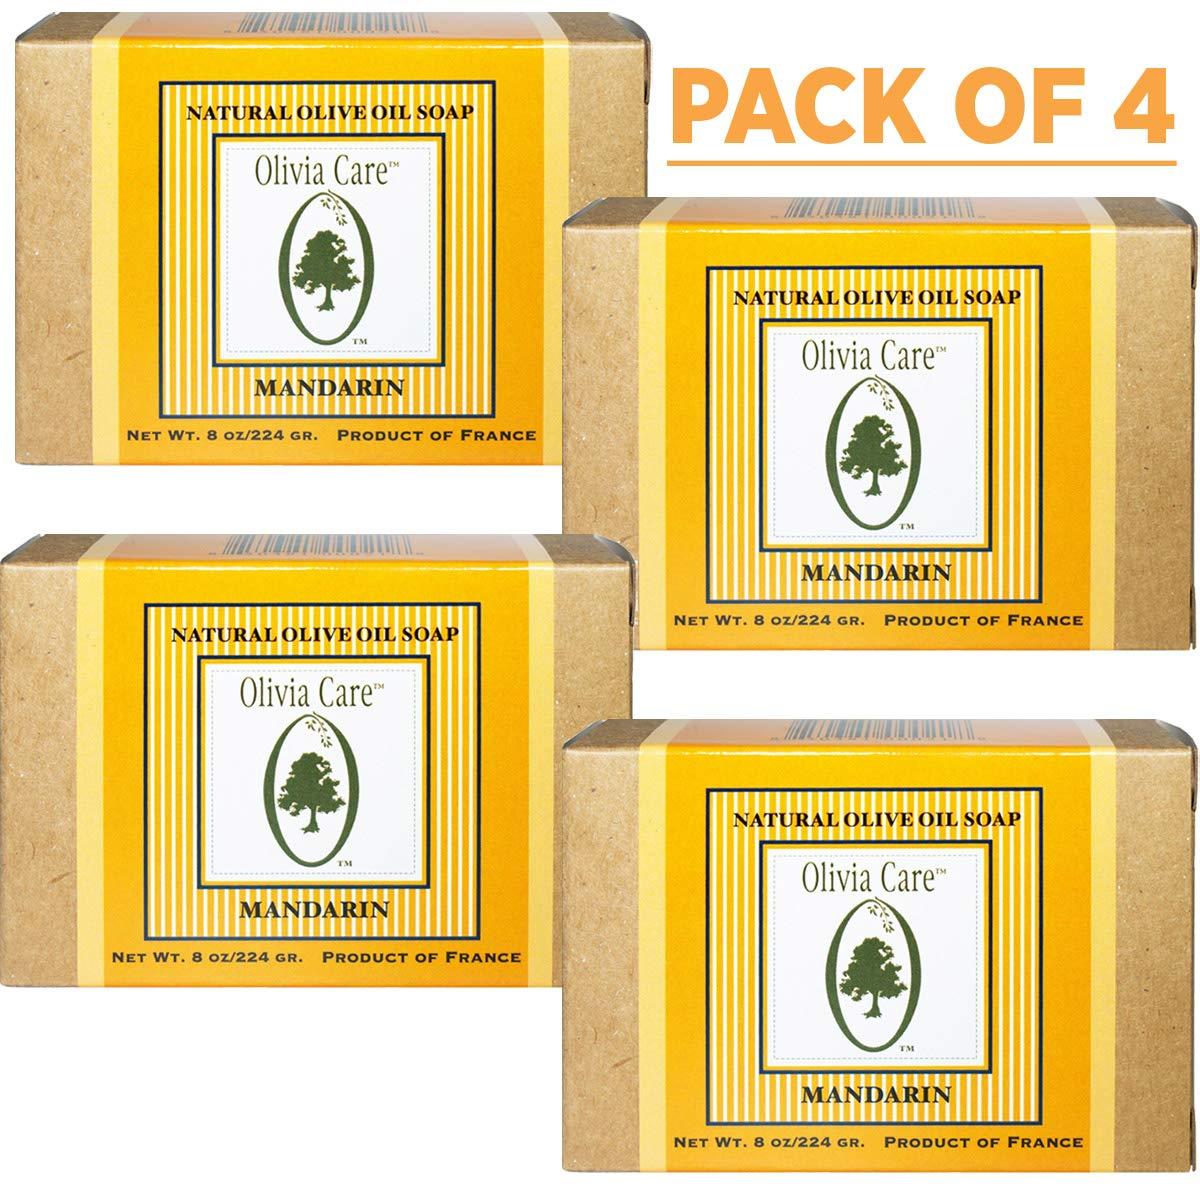 Olivia Care Premium Mandarin Bath & Body Bar Soap Organic, Vegan & NaturalOlive OilRepairs, Hydrates, Moisturizes & Deep Cleans Vitamin C Good for Sensitive Dry SkinMade in USA 8 OZ – (4 PACK)